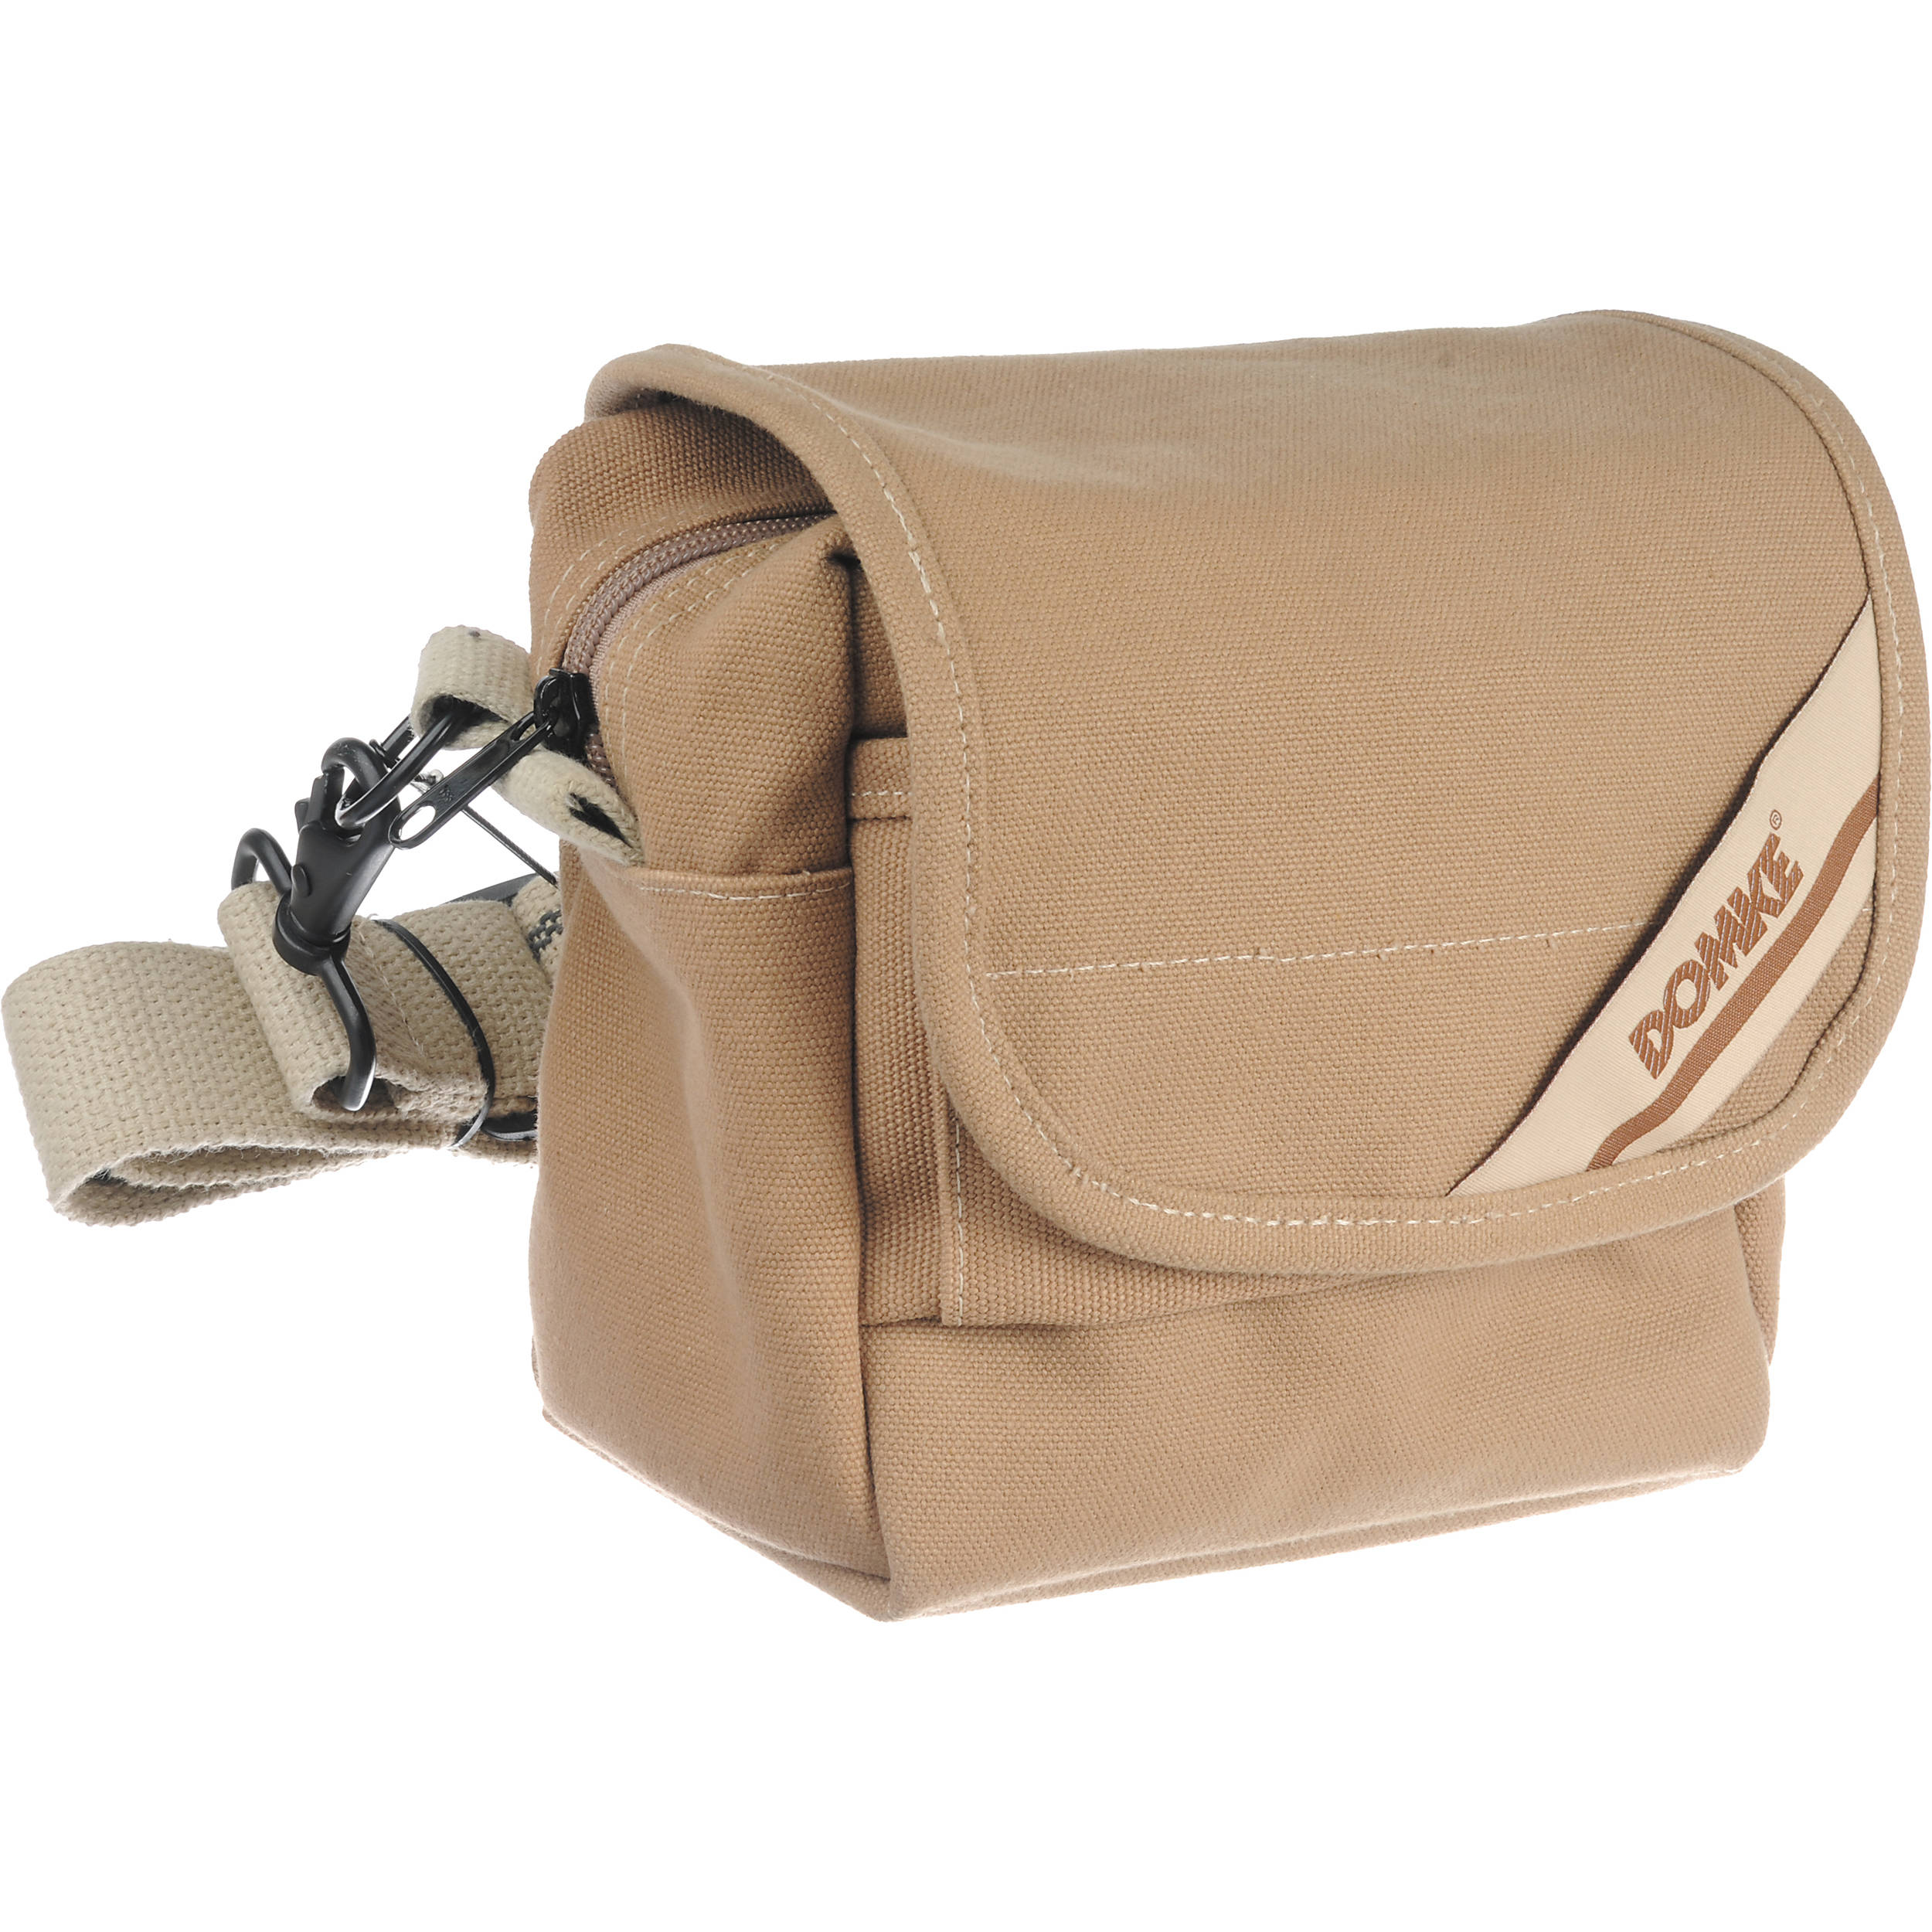 Domke F 5xa Shoulder And Belt Bag